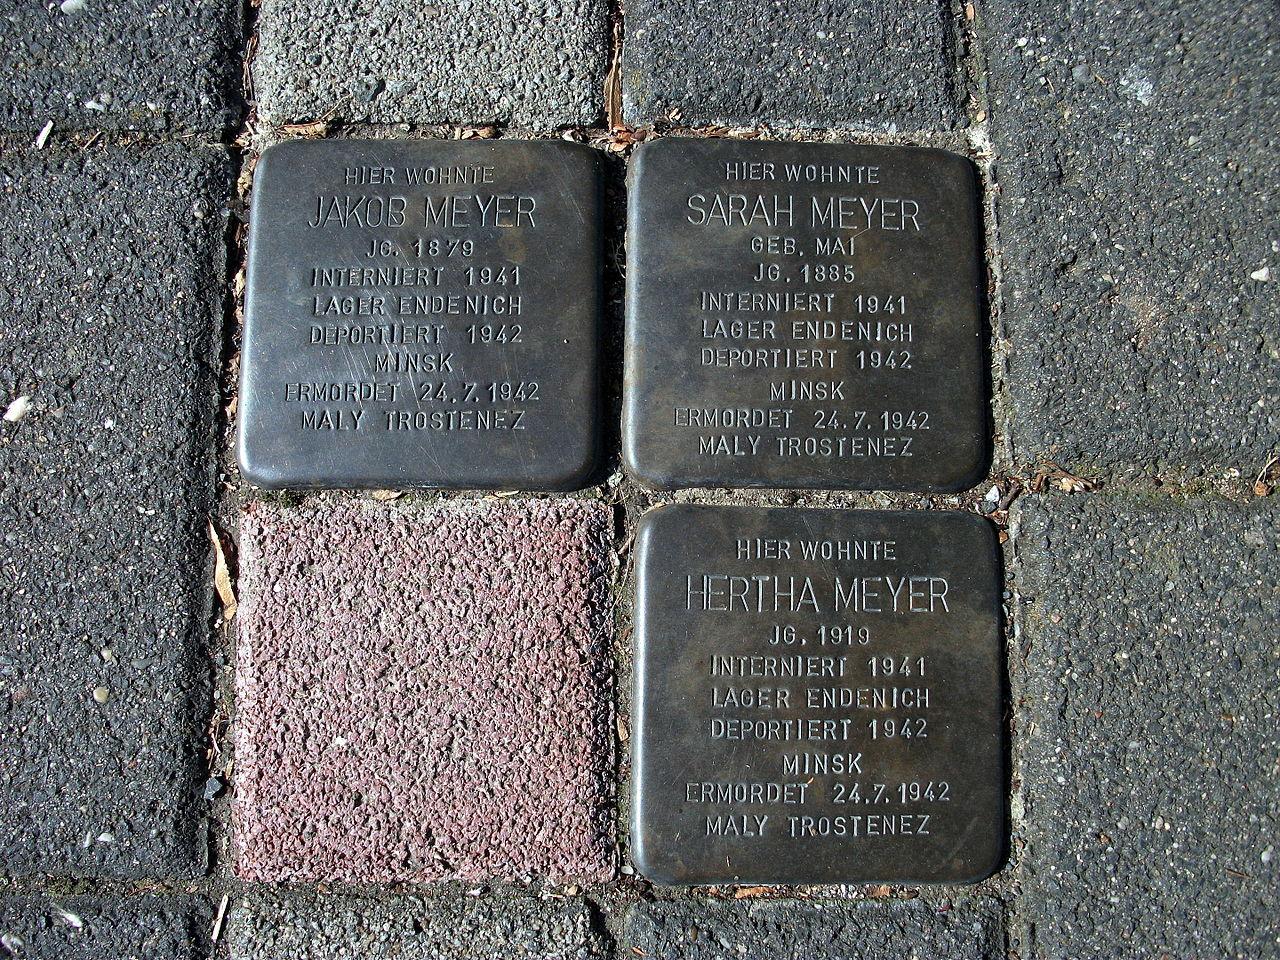 Stolpersteins Jakob Meyer, Sarah Meyer, Hertha Meyer Crossing Euskirchener Straße 52, Theodor-Litt-Straße Bonn.JPG